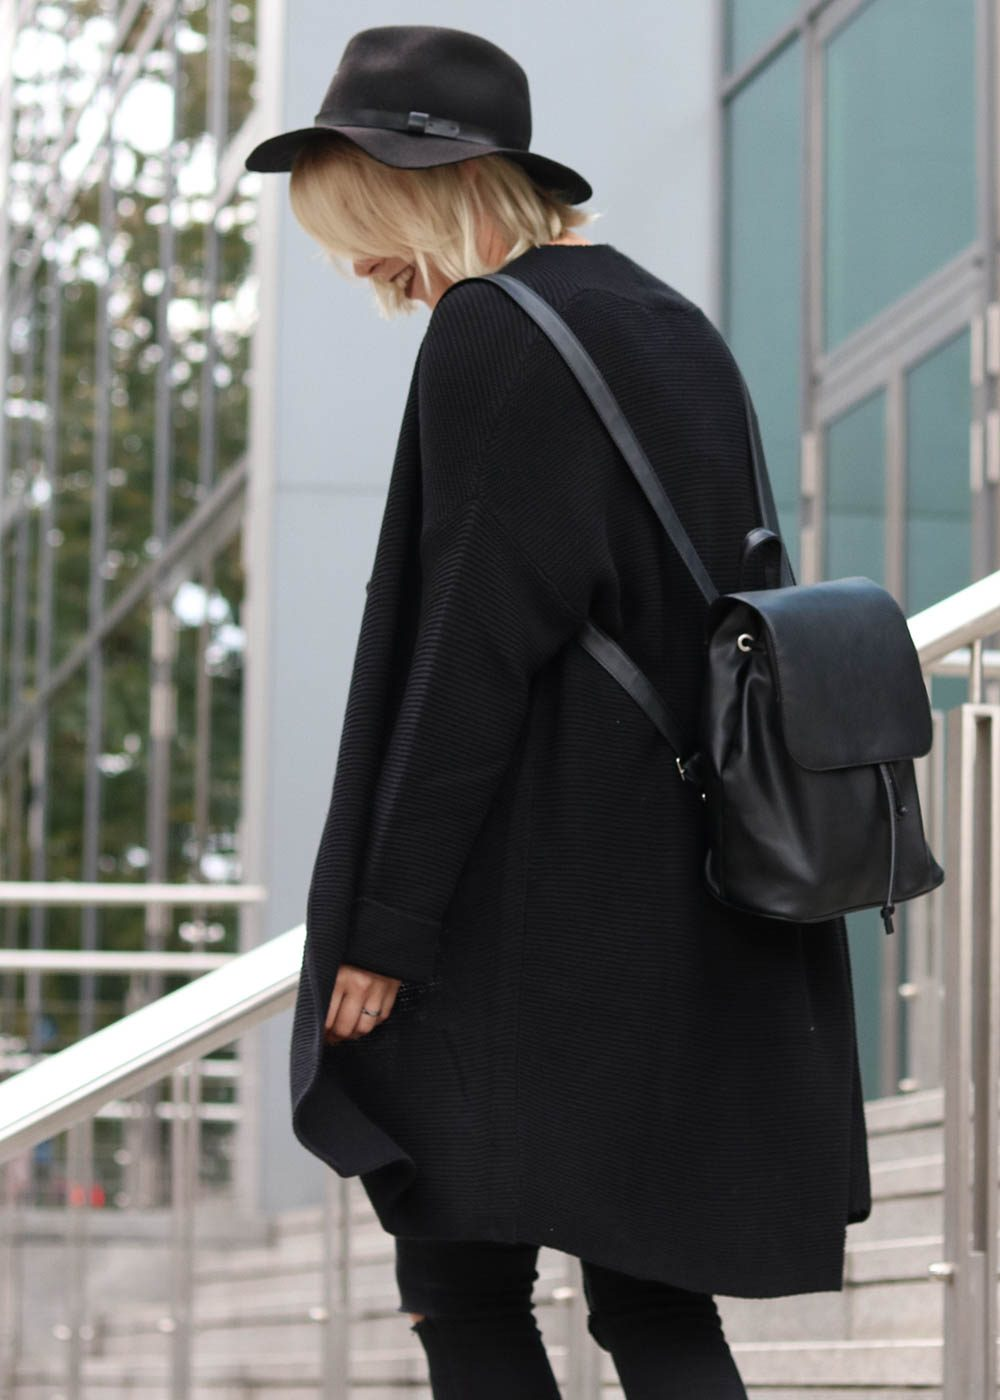 fashionblogger-mannheim-outfit-longcardigan-nike-air-max-skinnyjeans-rucksack-7-von-20